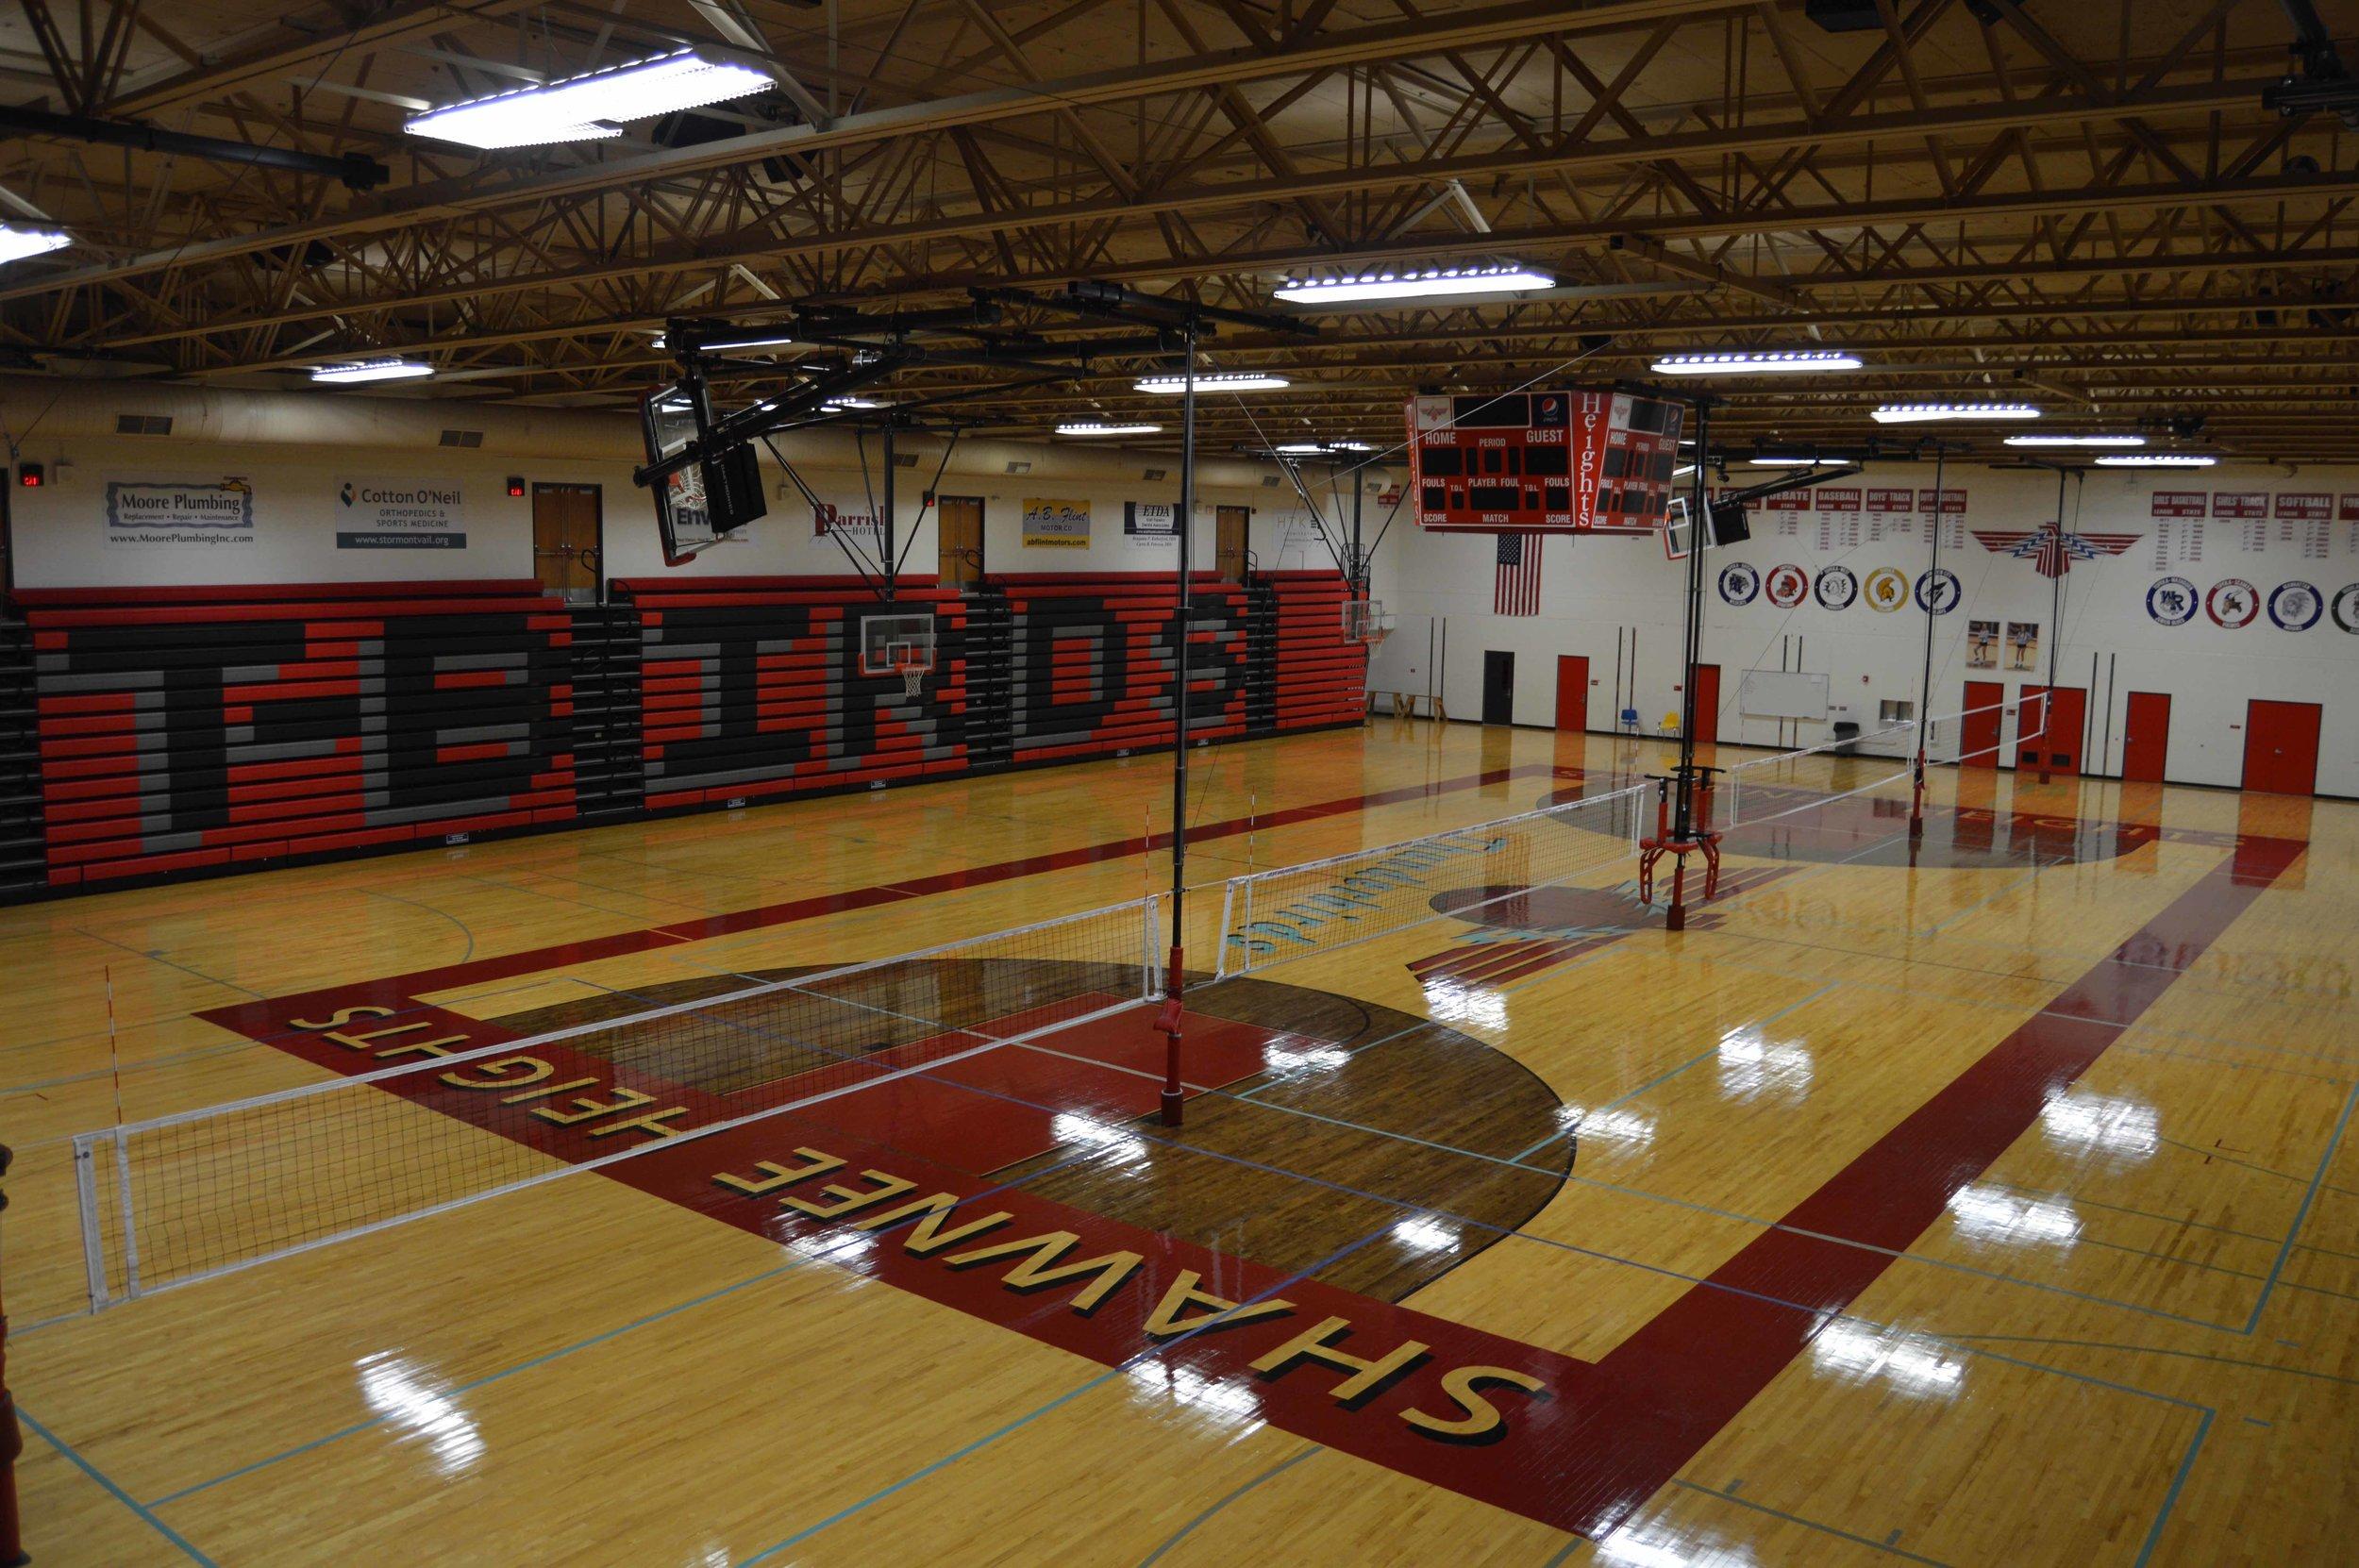 Shawnee Heights High School Gymnasium   Client: USD 450 Shawnee Heights Architect: Professional Engineering Consultants